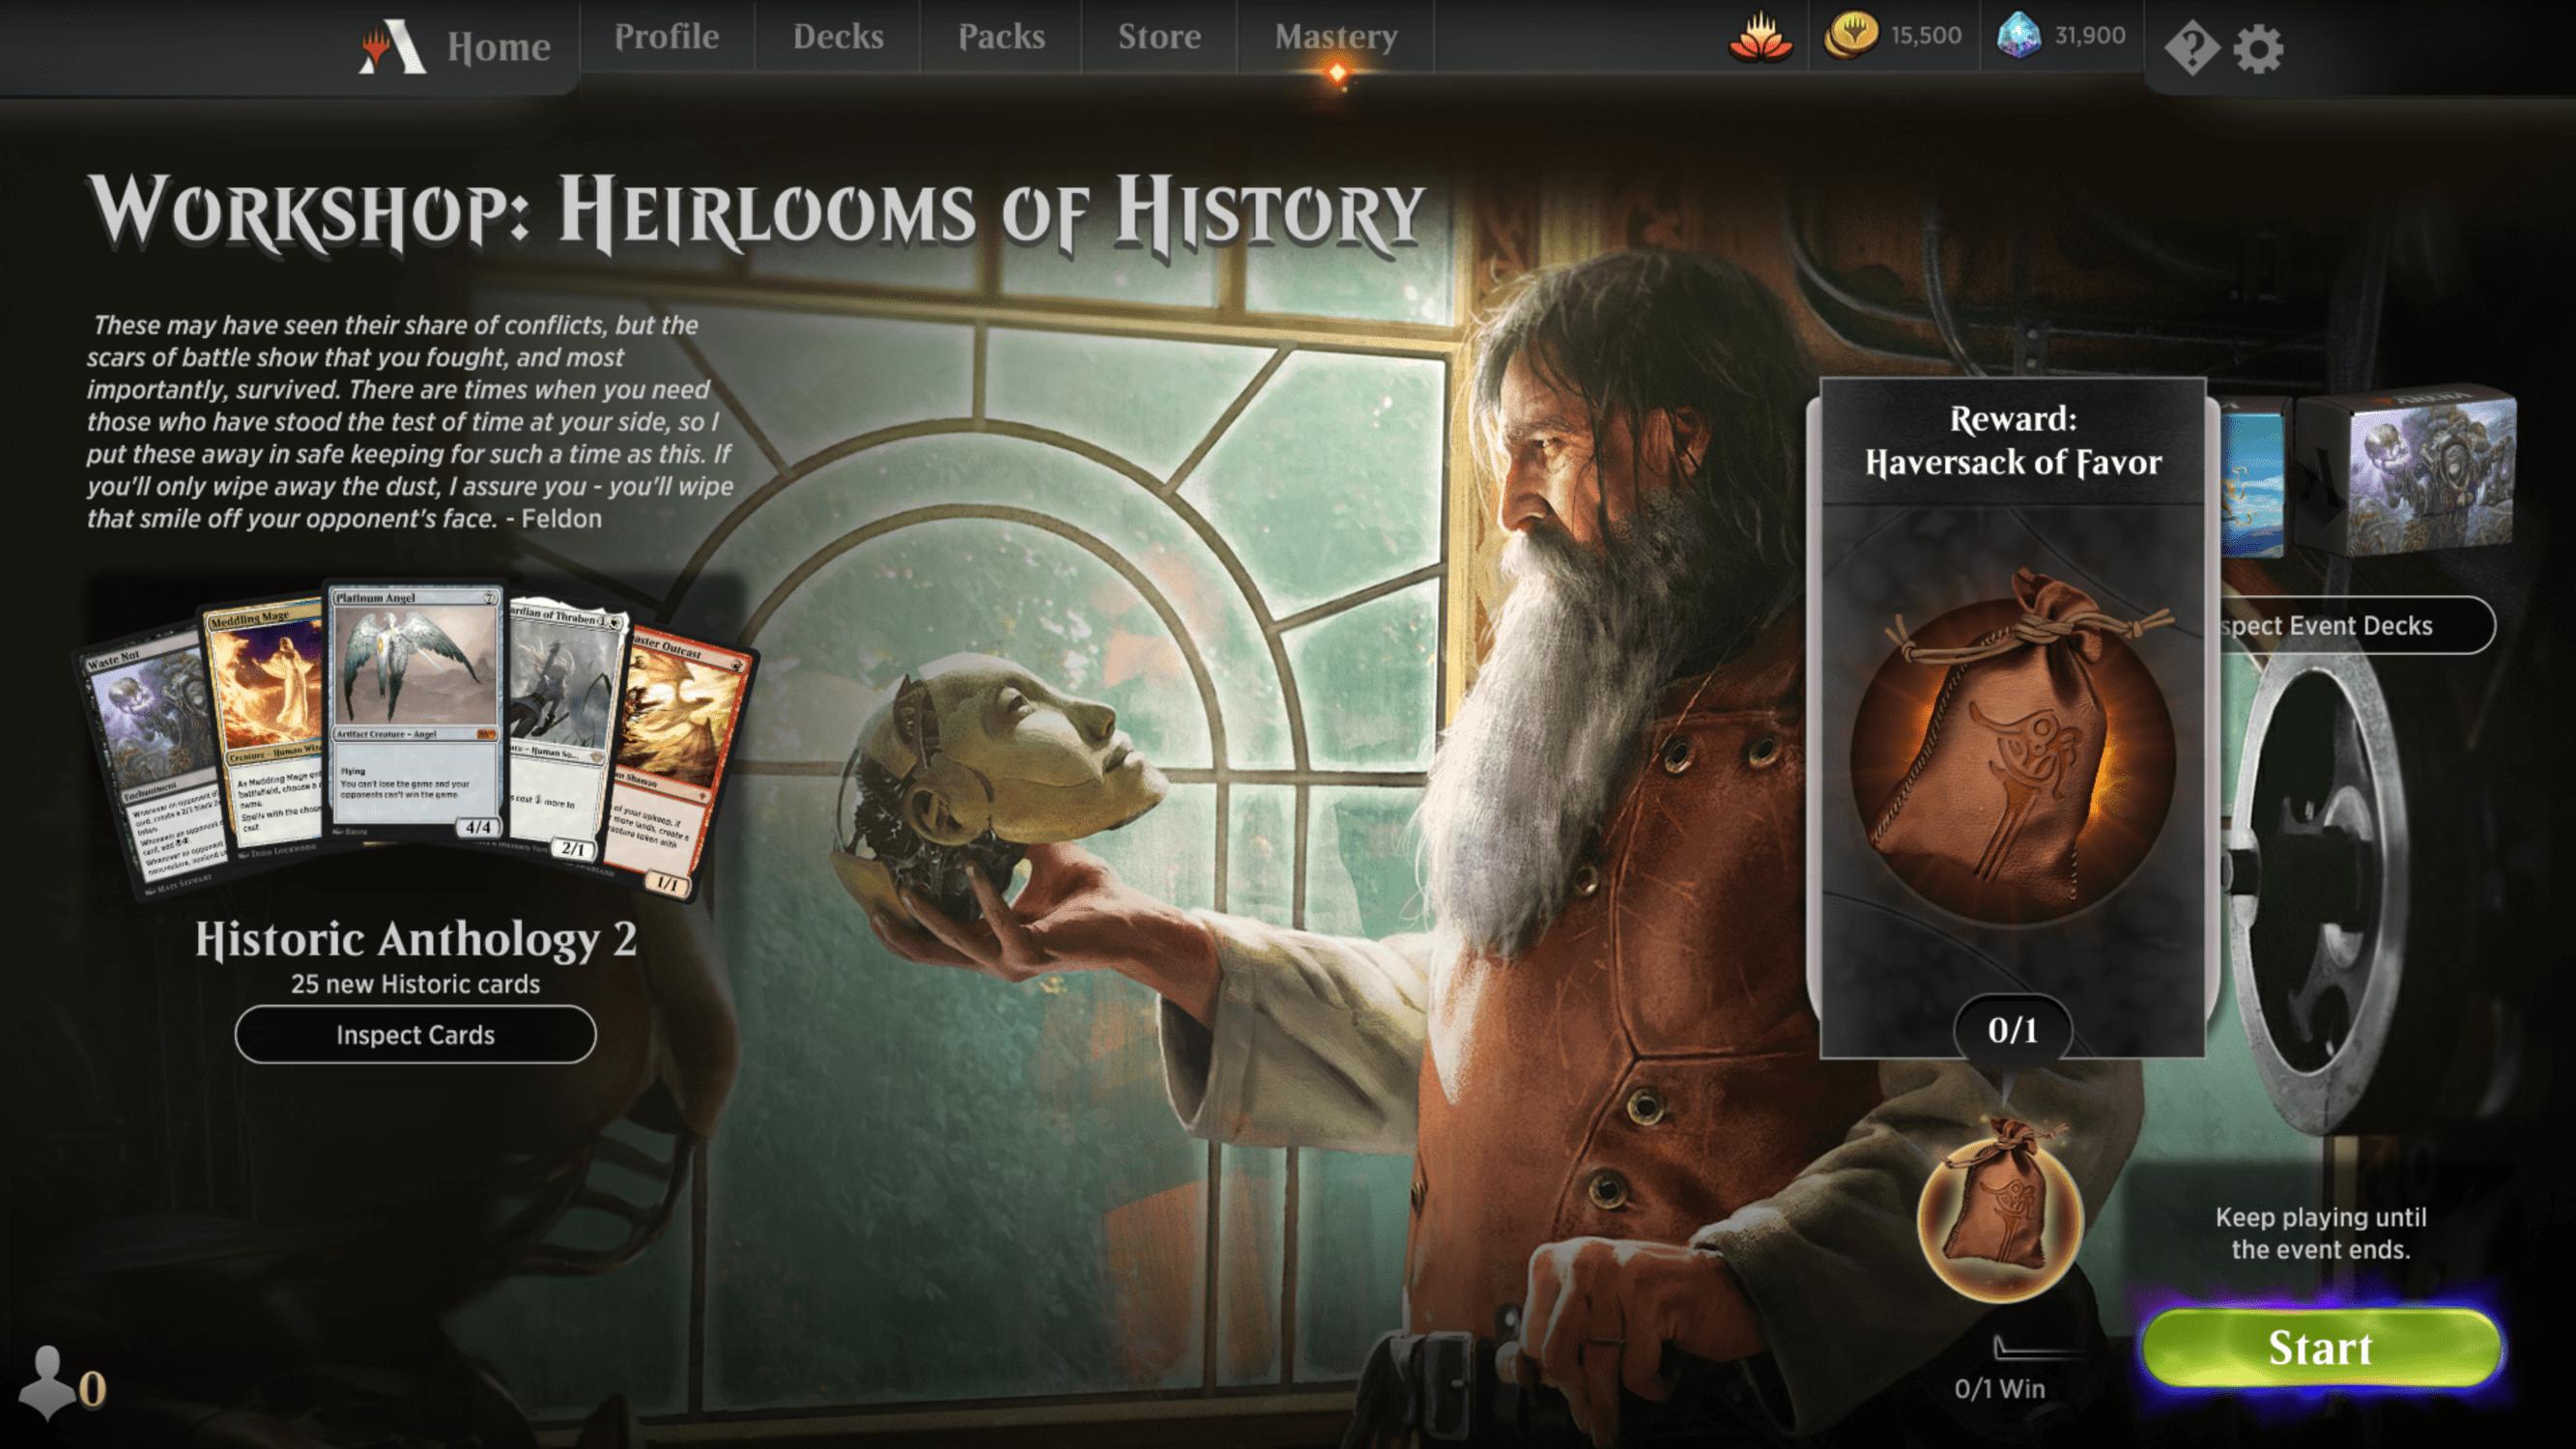 MTG Arena Workshop Heirlooms of History event screen